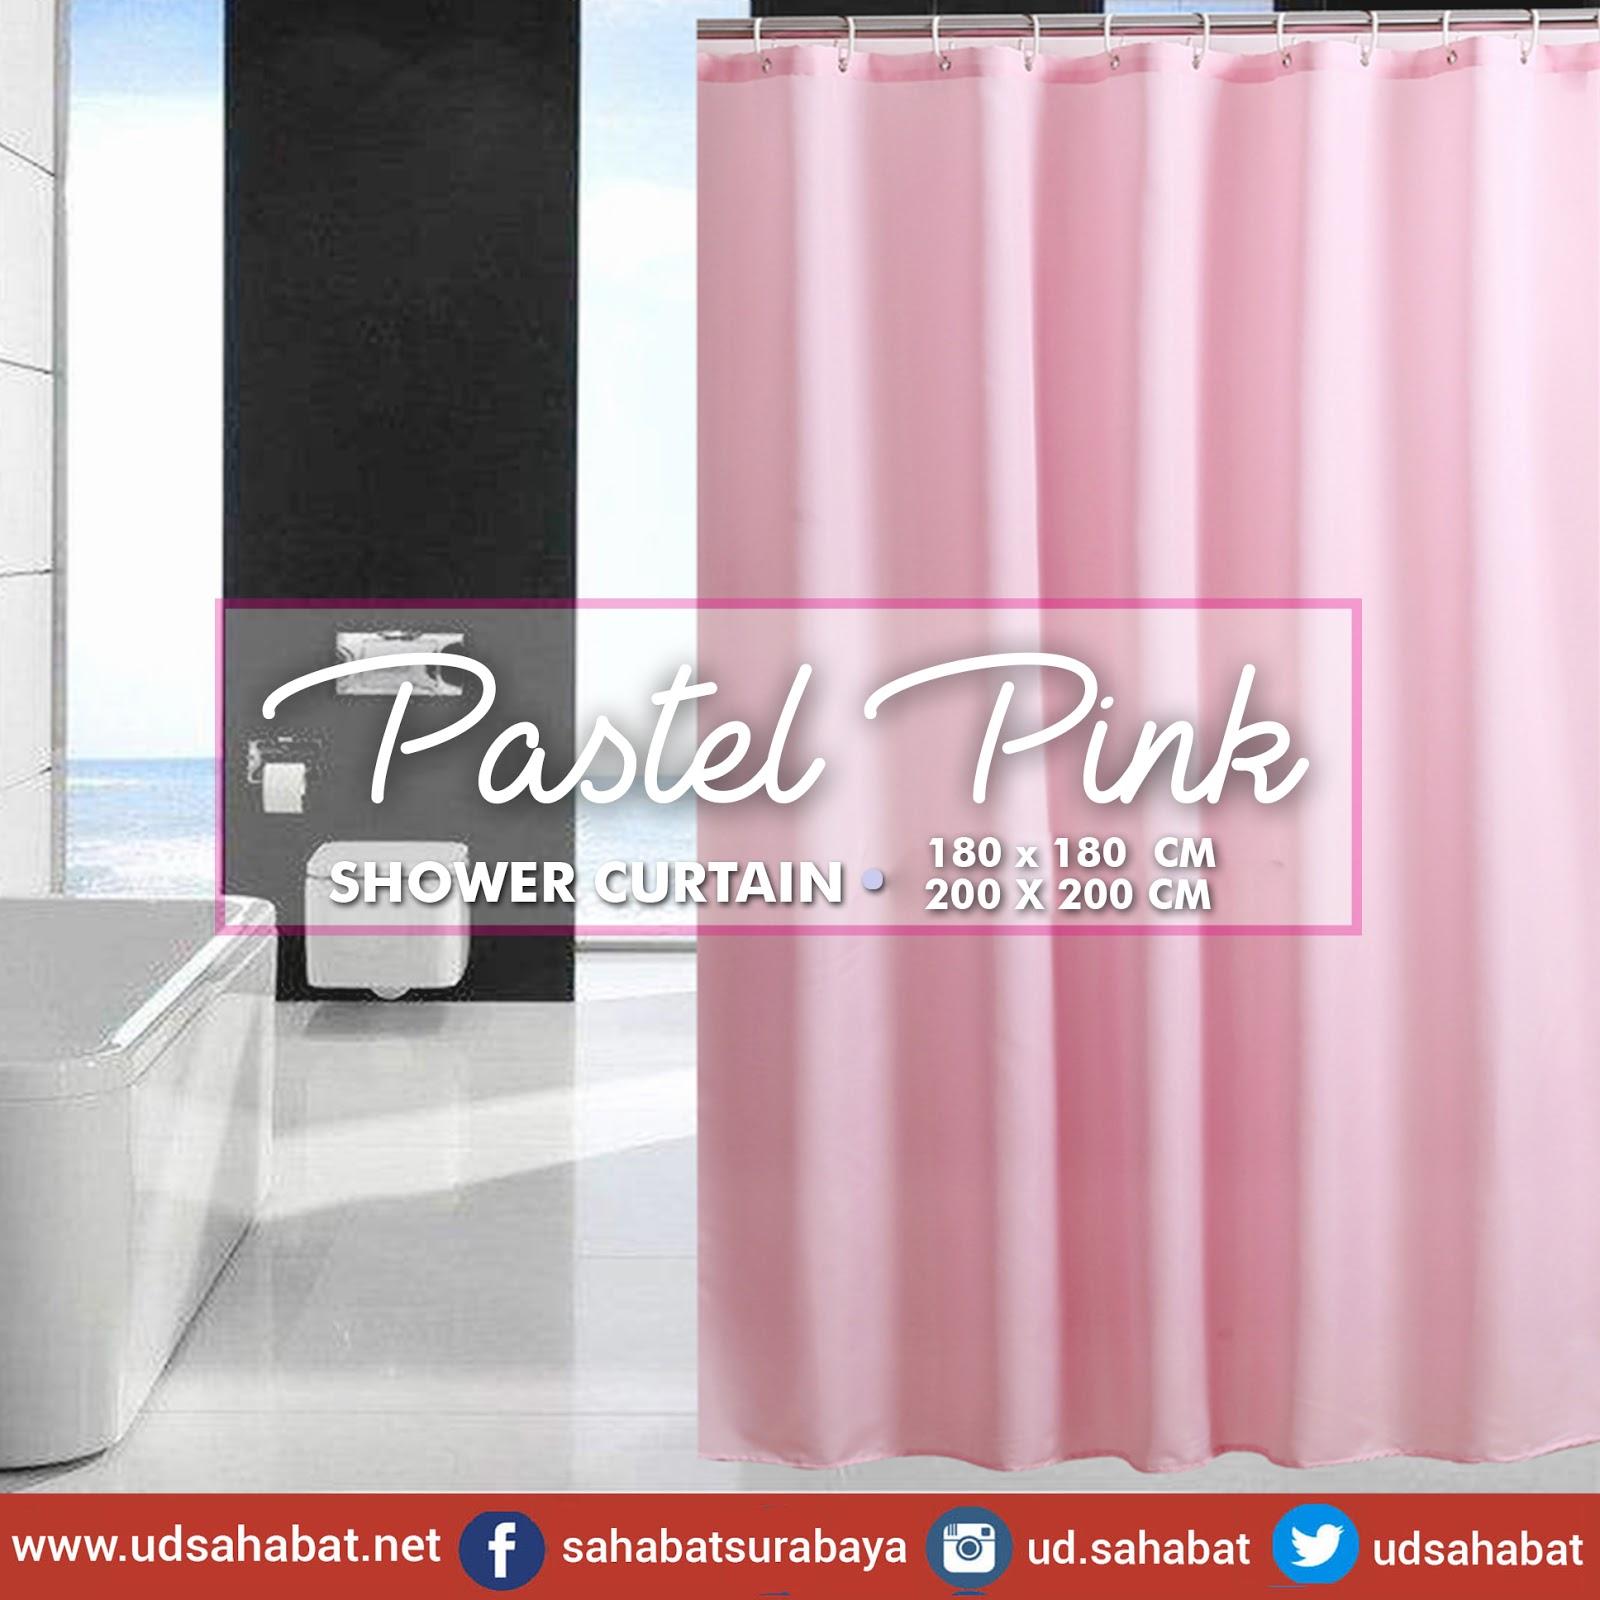 jual korden kamar mandi bathub pink surabaya udsahabat baliwerti